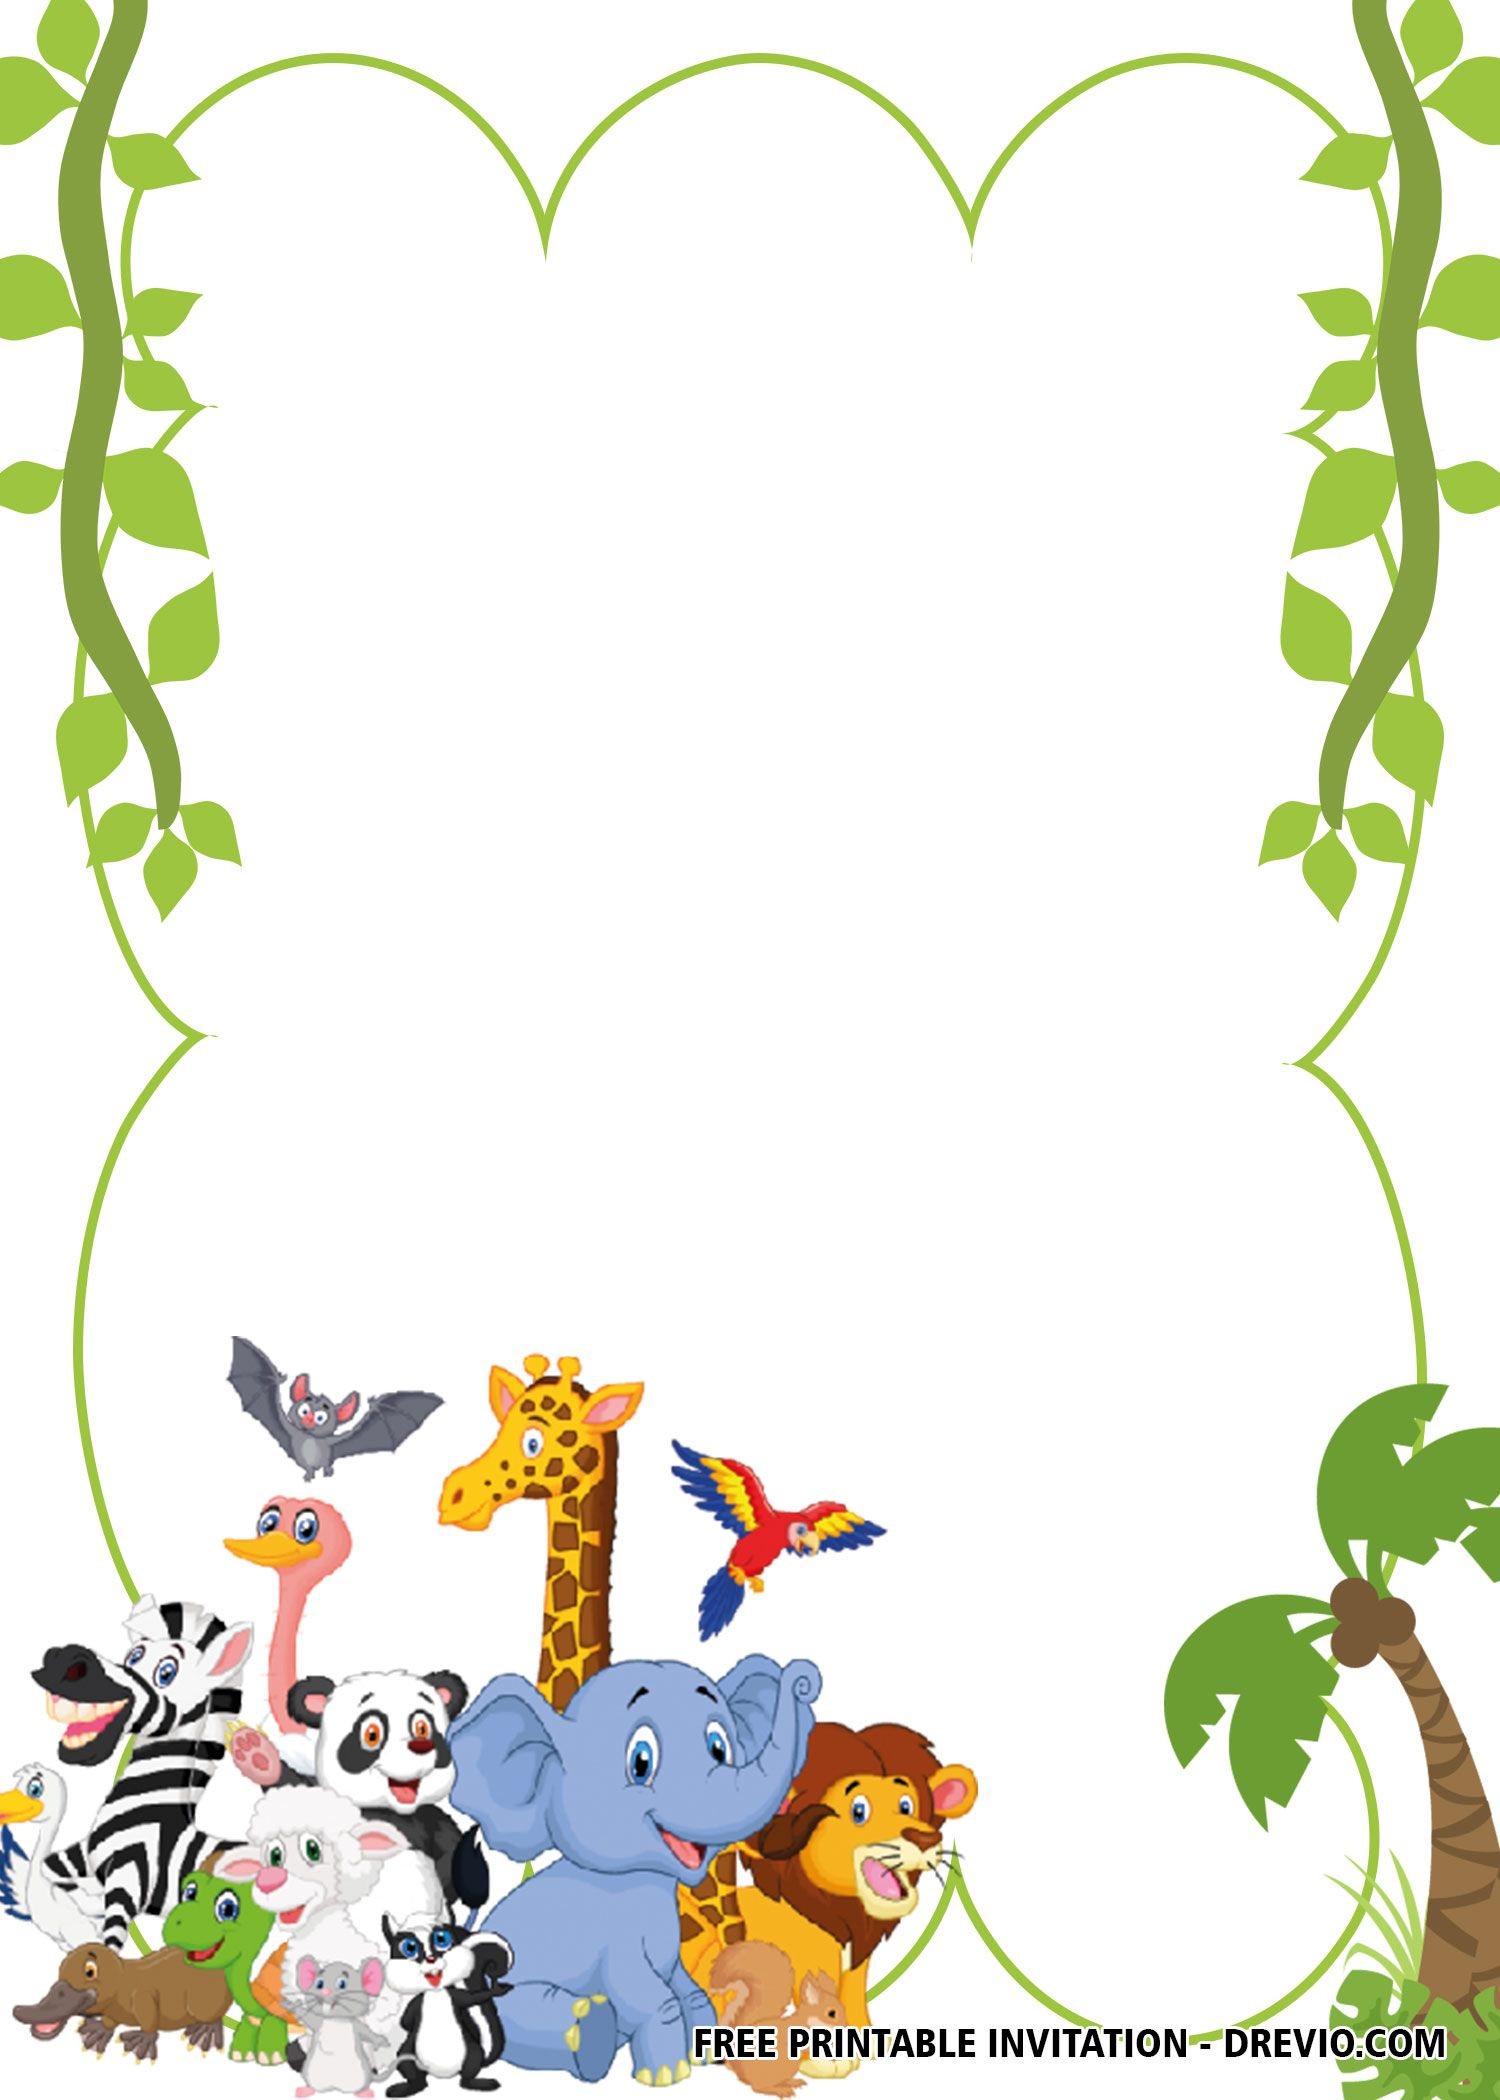 Free Printable Wild Safari Invitation Templates Drevio Safari Invitations Safari Baby Shower Invitations Safari Birthday Party